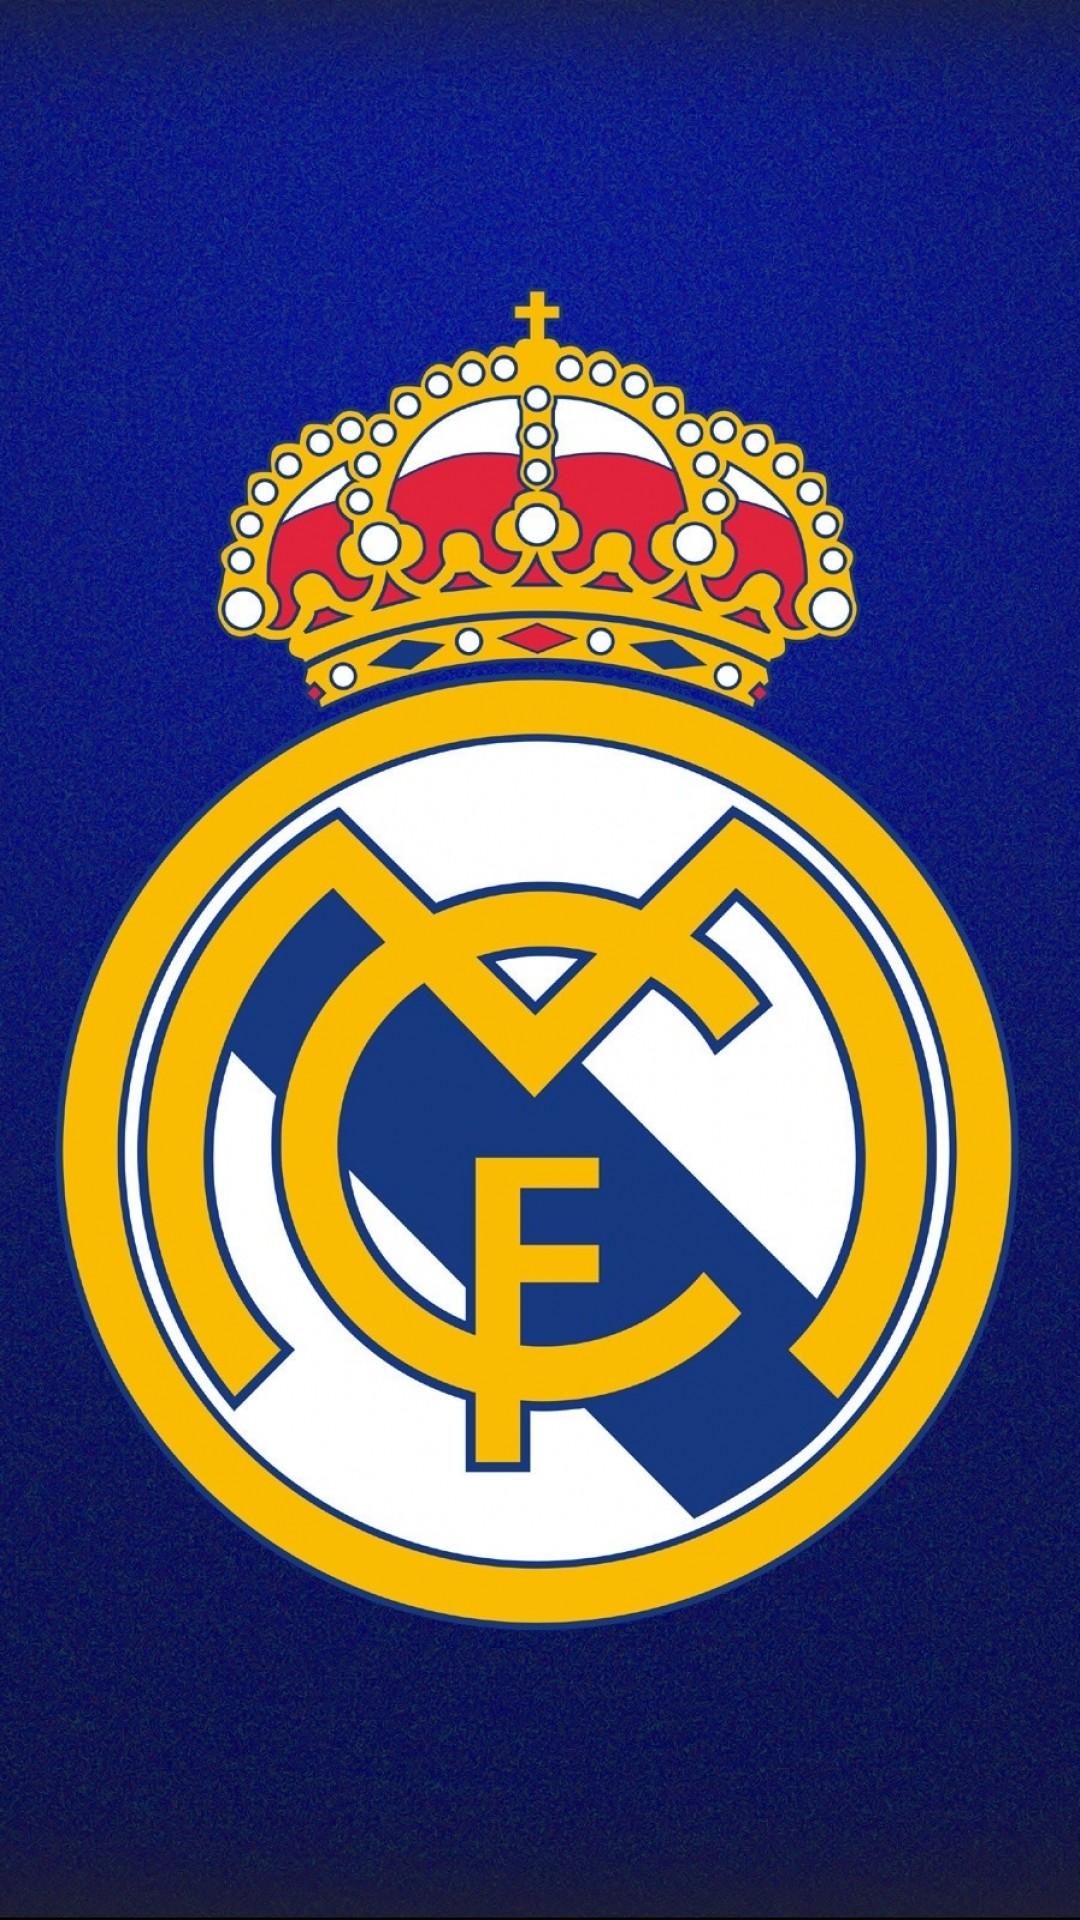 Real Madrid iPhone Wallpaper 1920×1200 Image Real Madrid Wallpapers (50  Wallpapers) | Adorable Wallpapers | Desktop | Pinterest | Real madrid  wallpapers, …